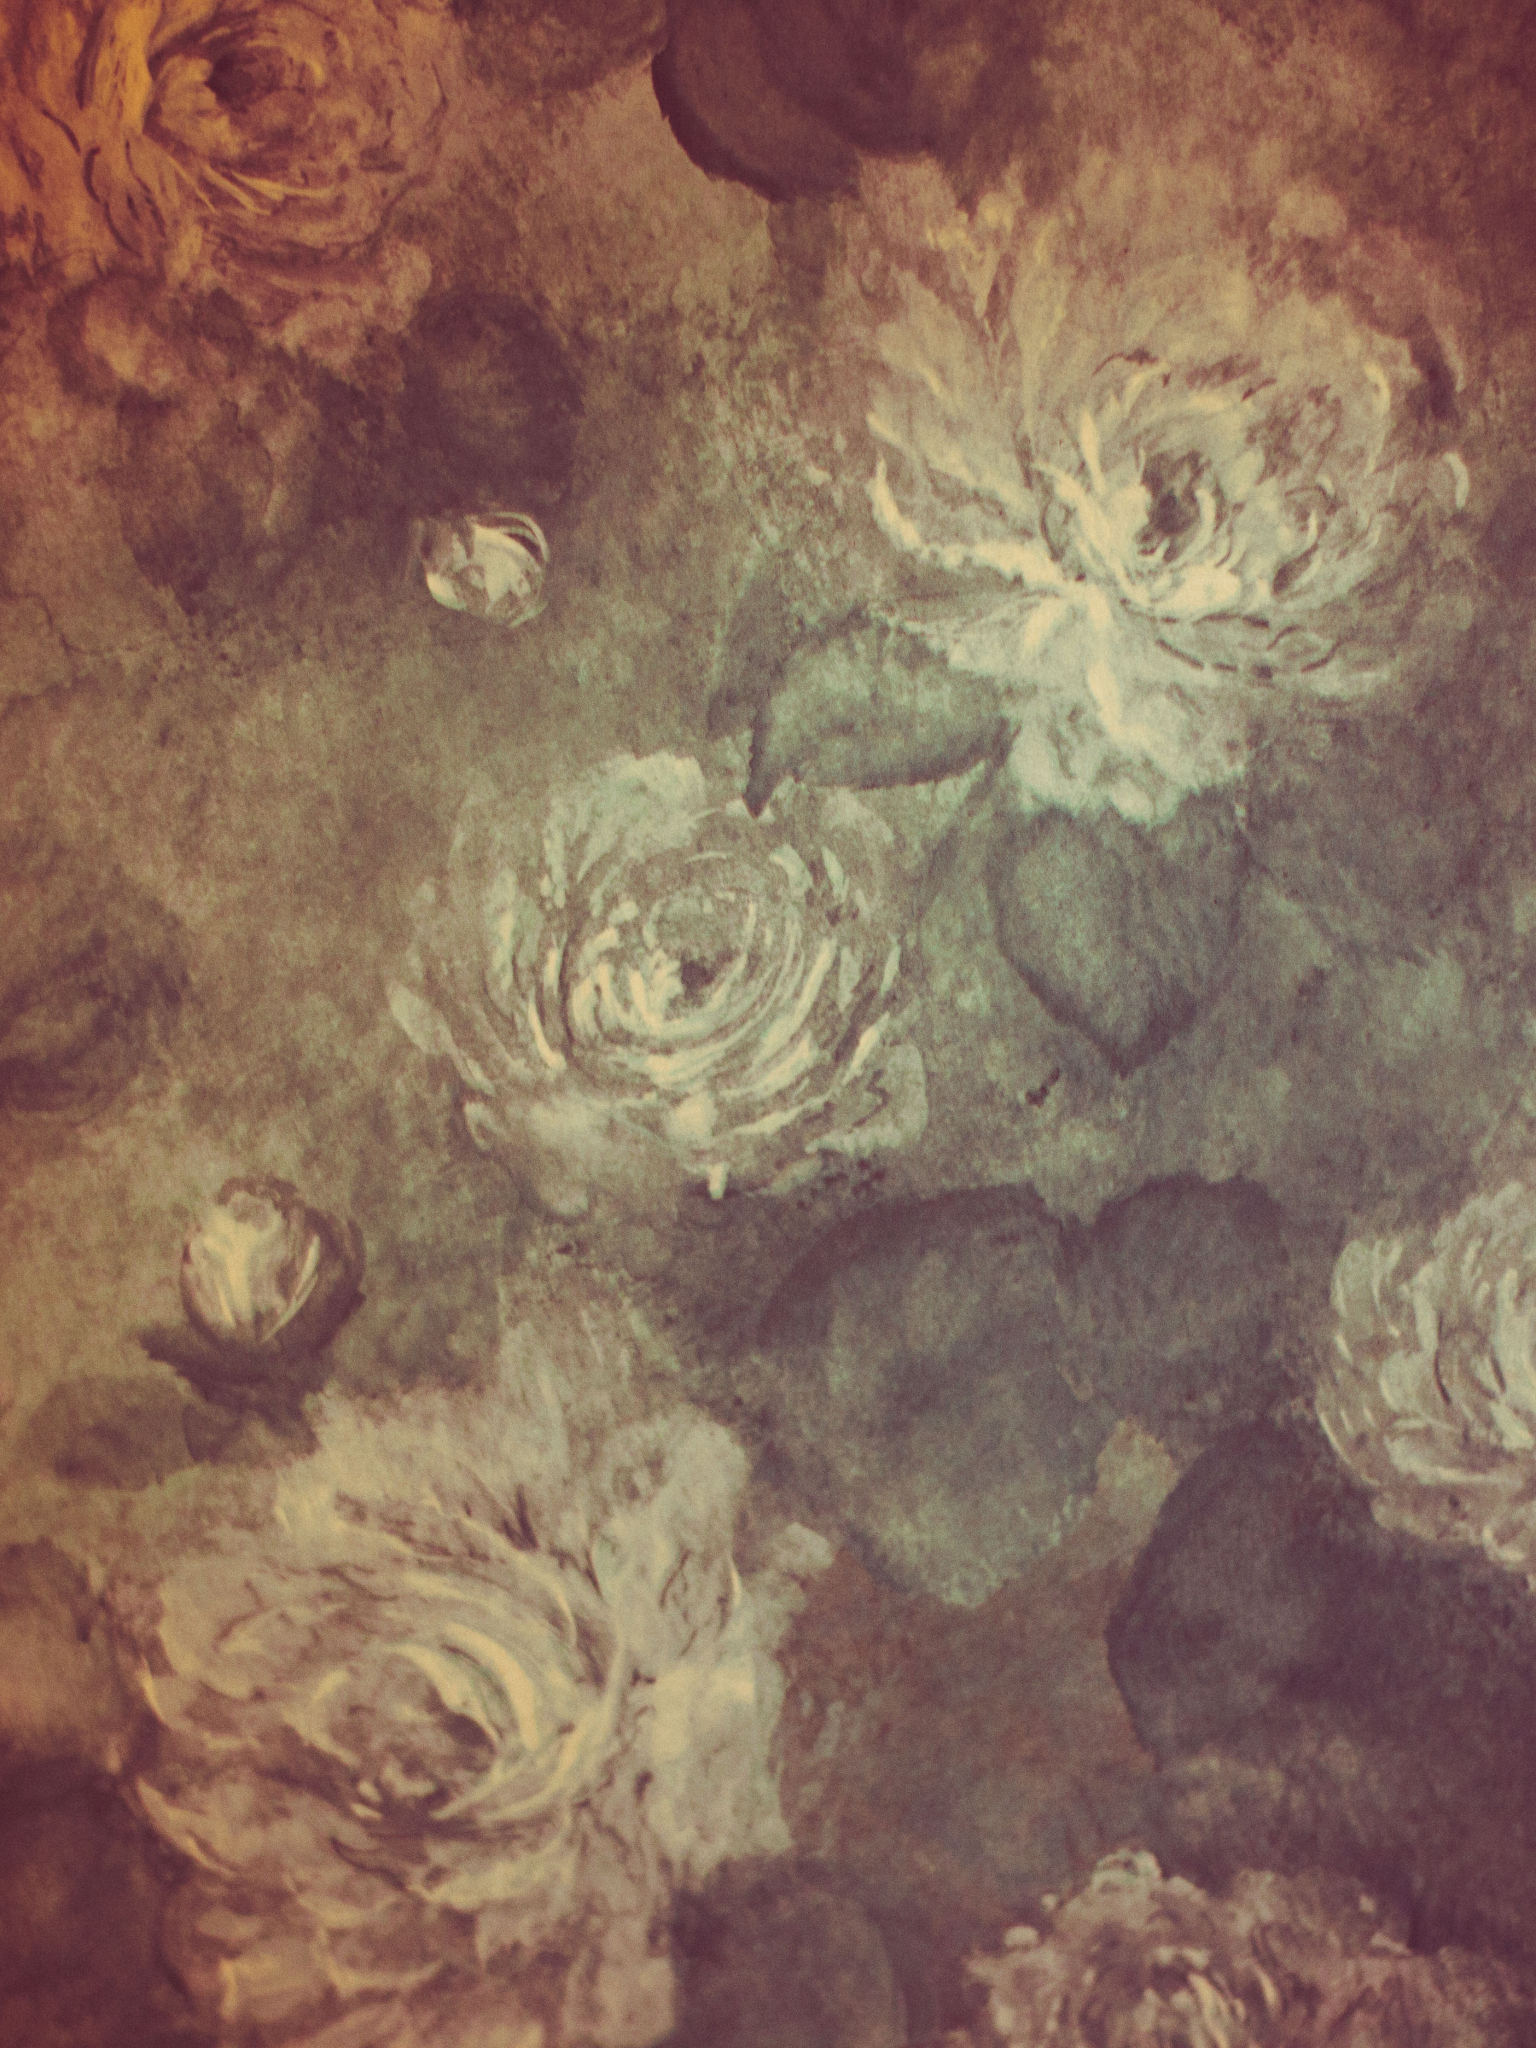 Free Download Vintage Floral Wallpaper Background Indiedesignercom